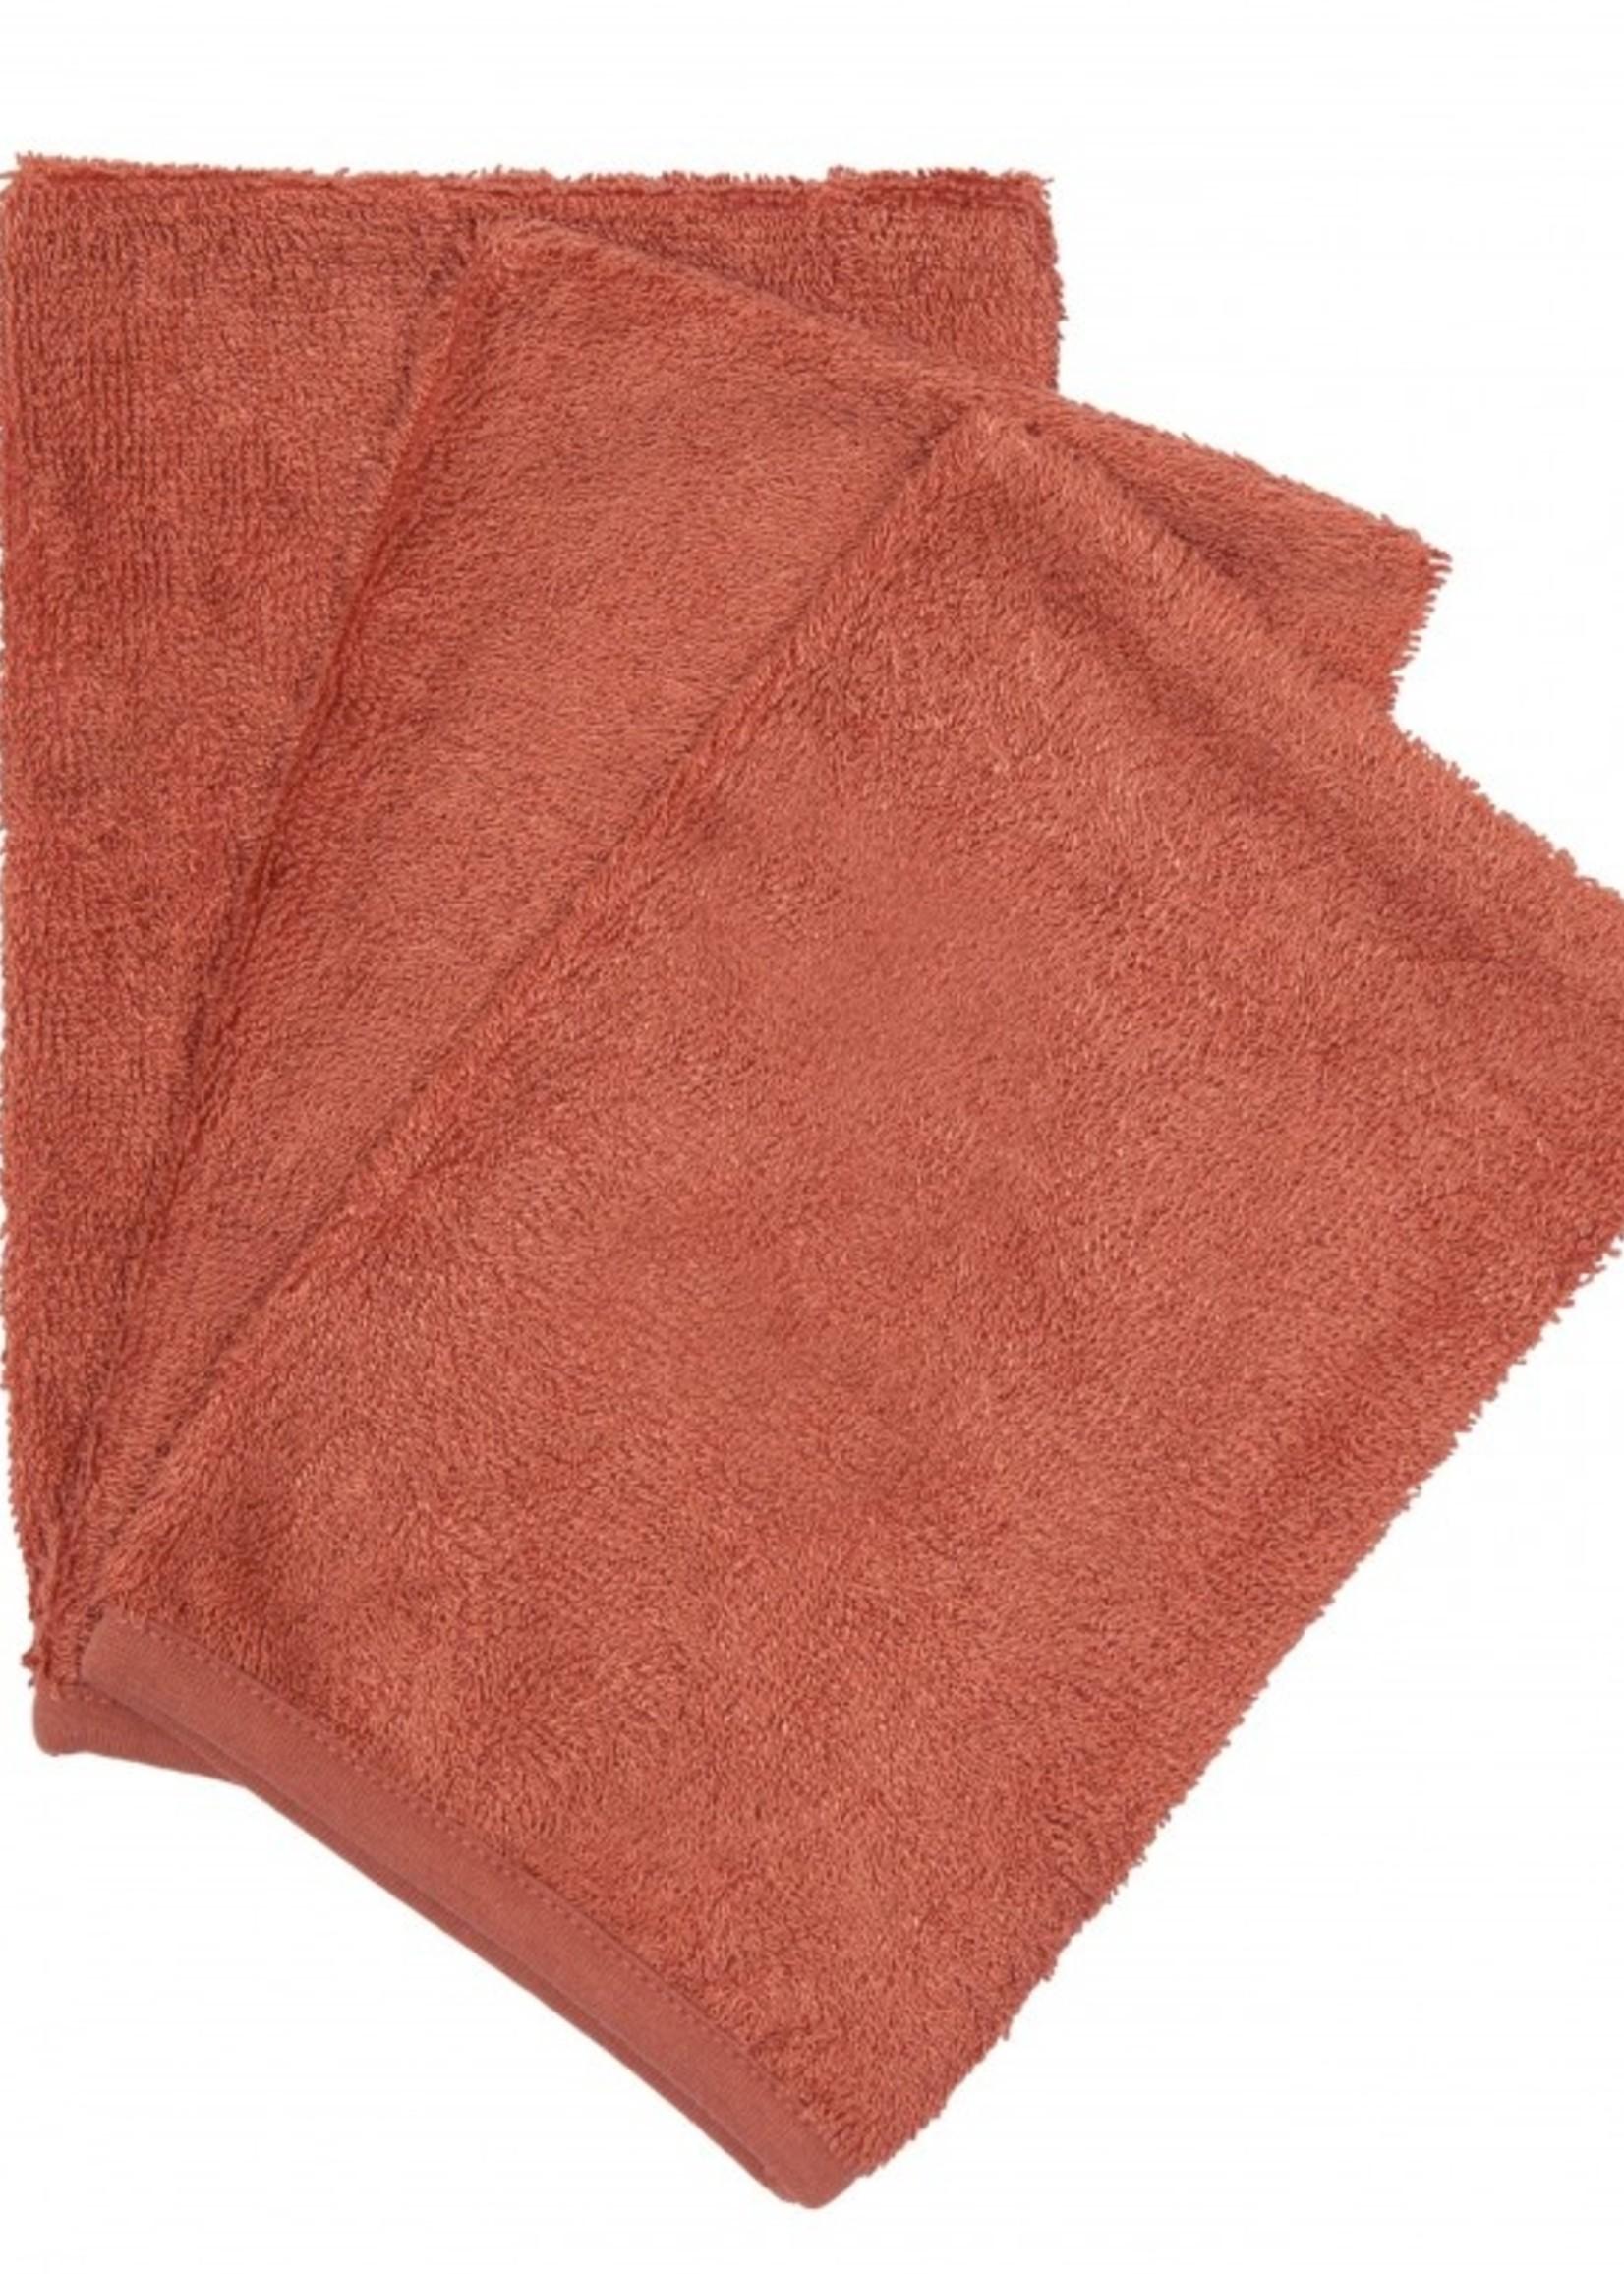 Timboo Set -  3 washcloths